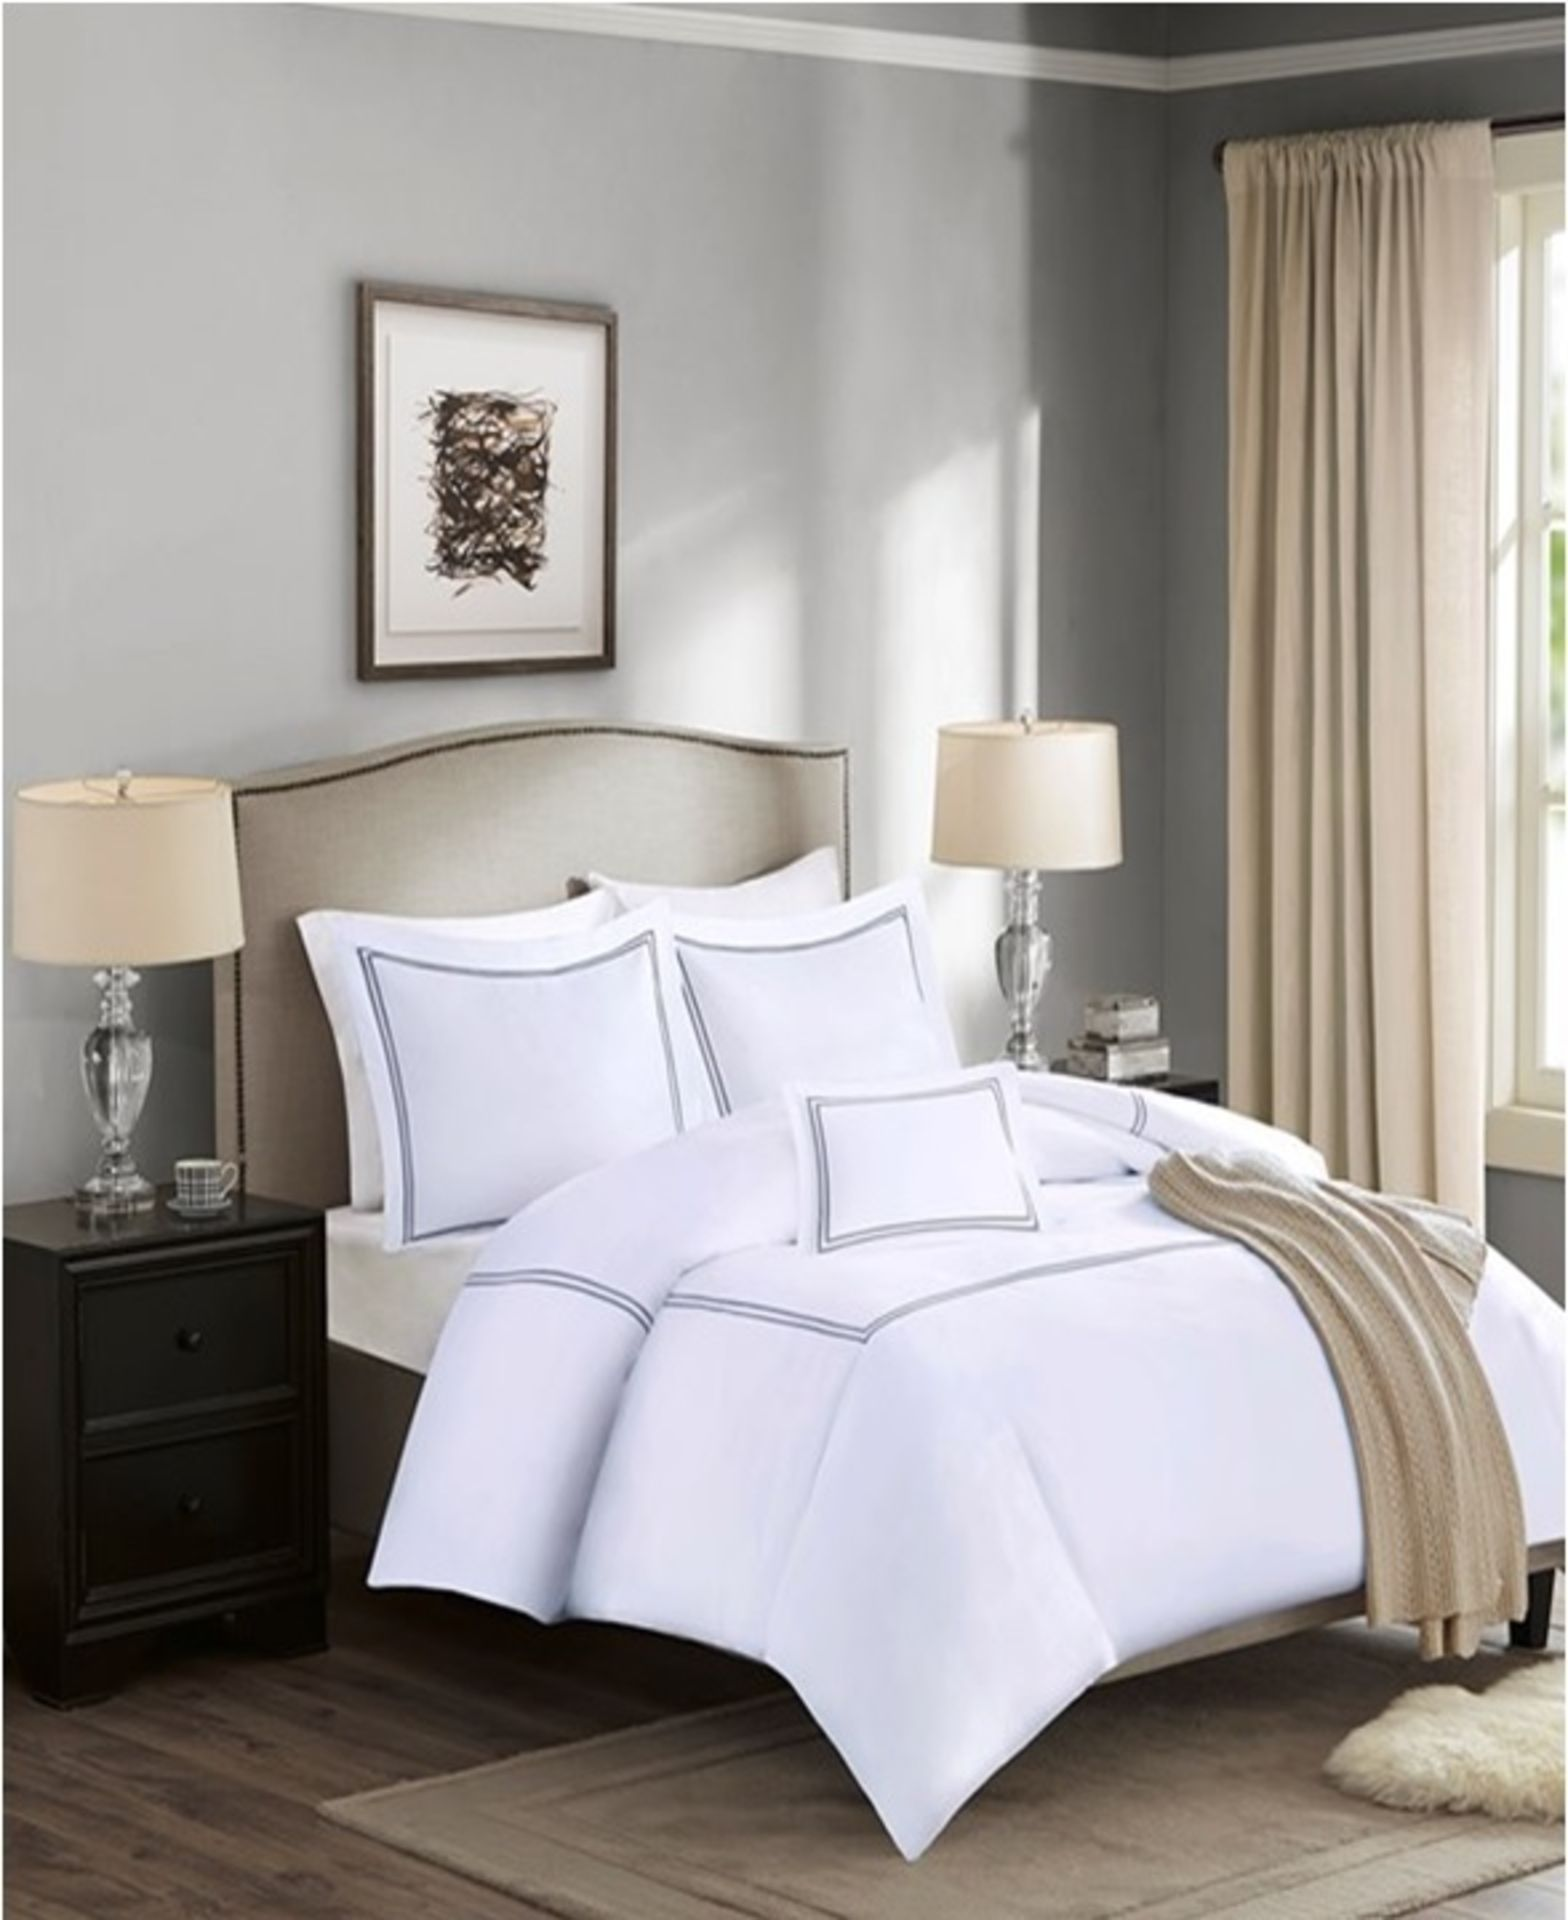 Lot 159 - 1 x Madison Park Luxury Collection King Duvet Set White - Product Code MP12-0199UK (Brand New -